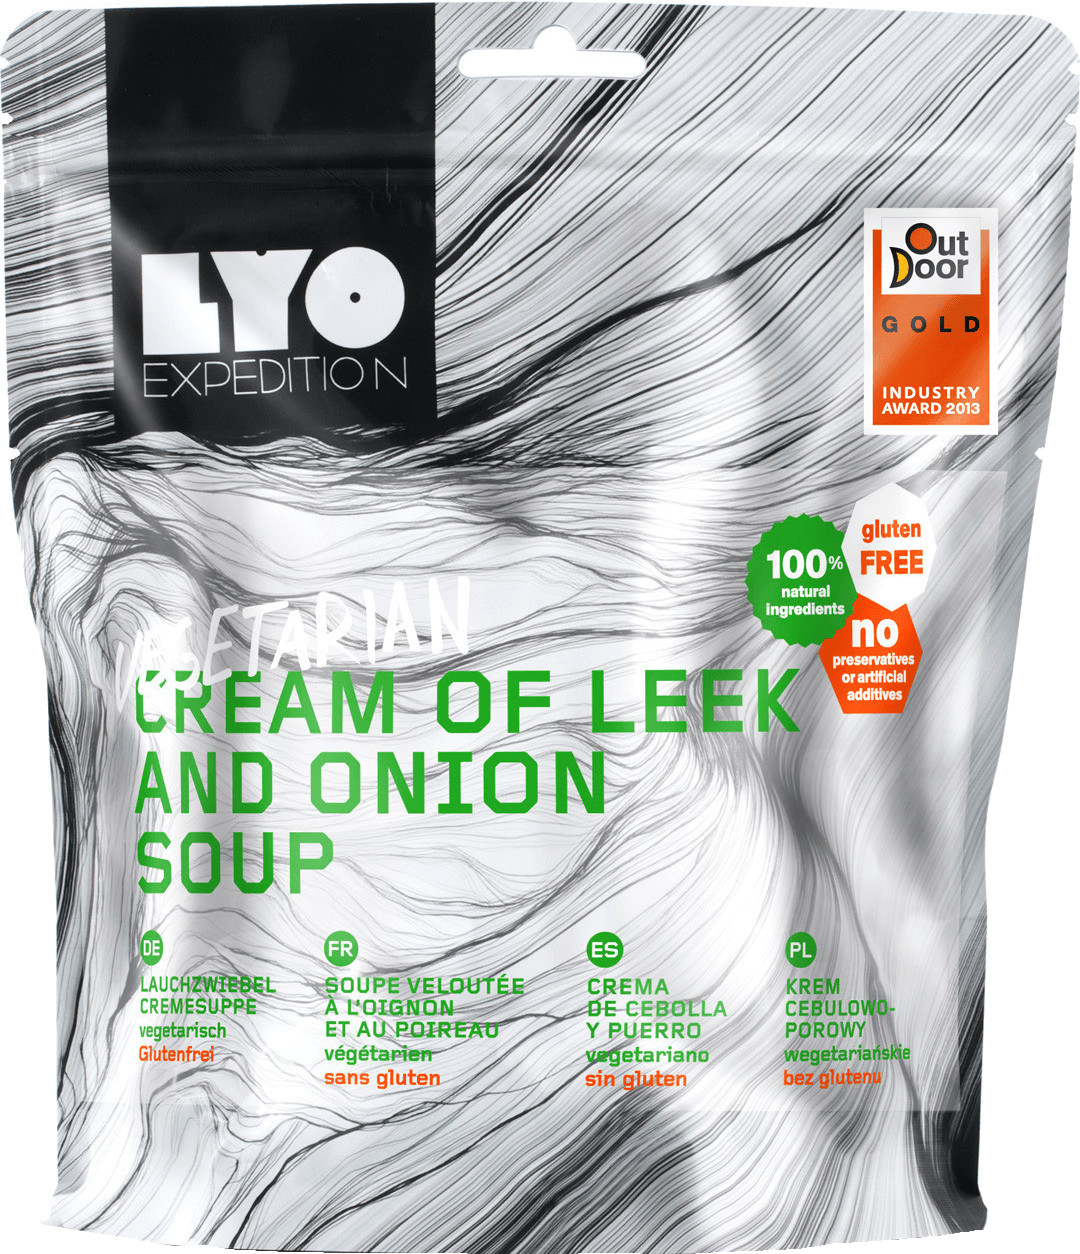 Lyo Expedition Lauchzwiebel Cremesuppe (55 g)